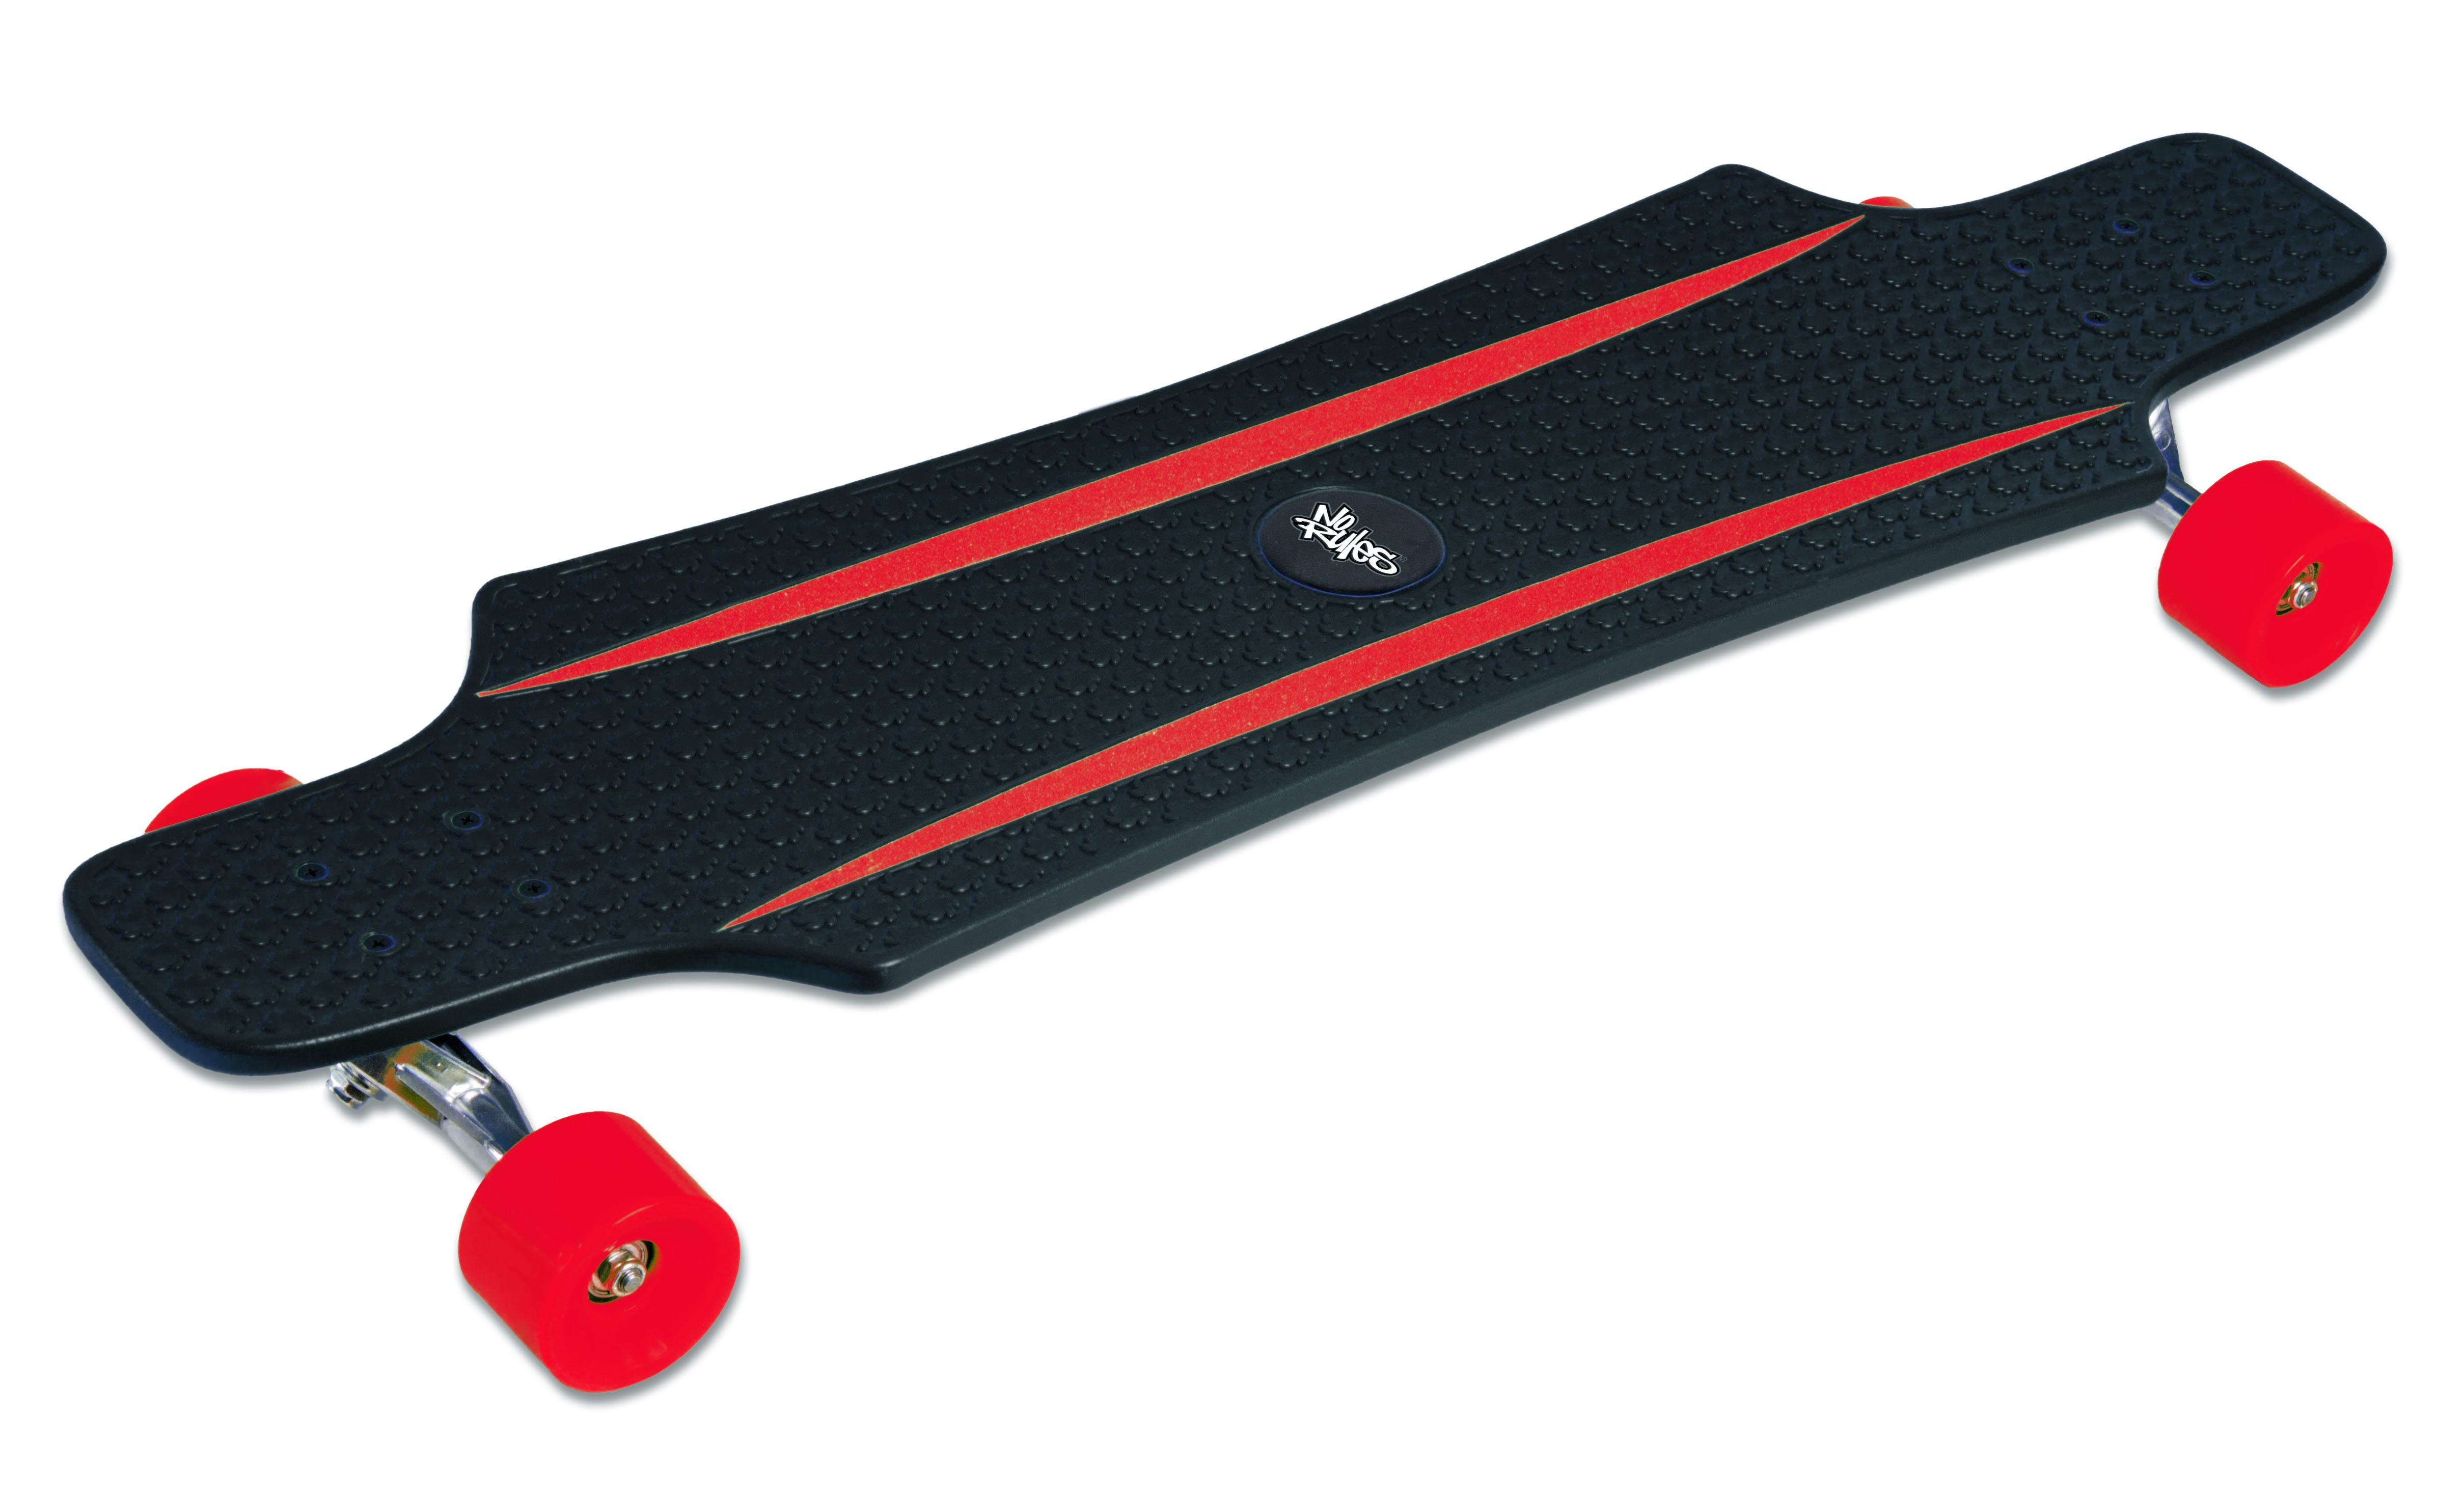 No Rules PP-FLEX Longboard skrituļdēlis, ABEC 7 (melns/sarkans, zils/zaļš) AU 245 Skrejriteņi